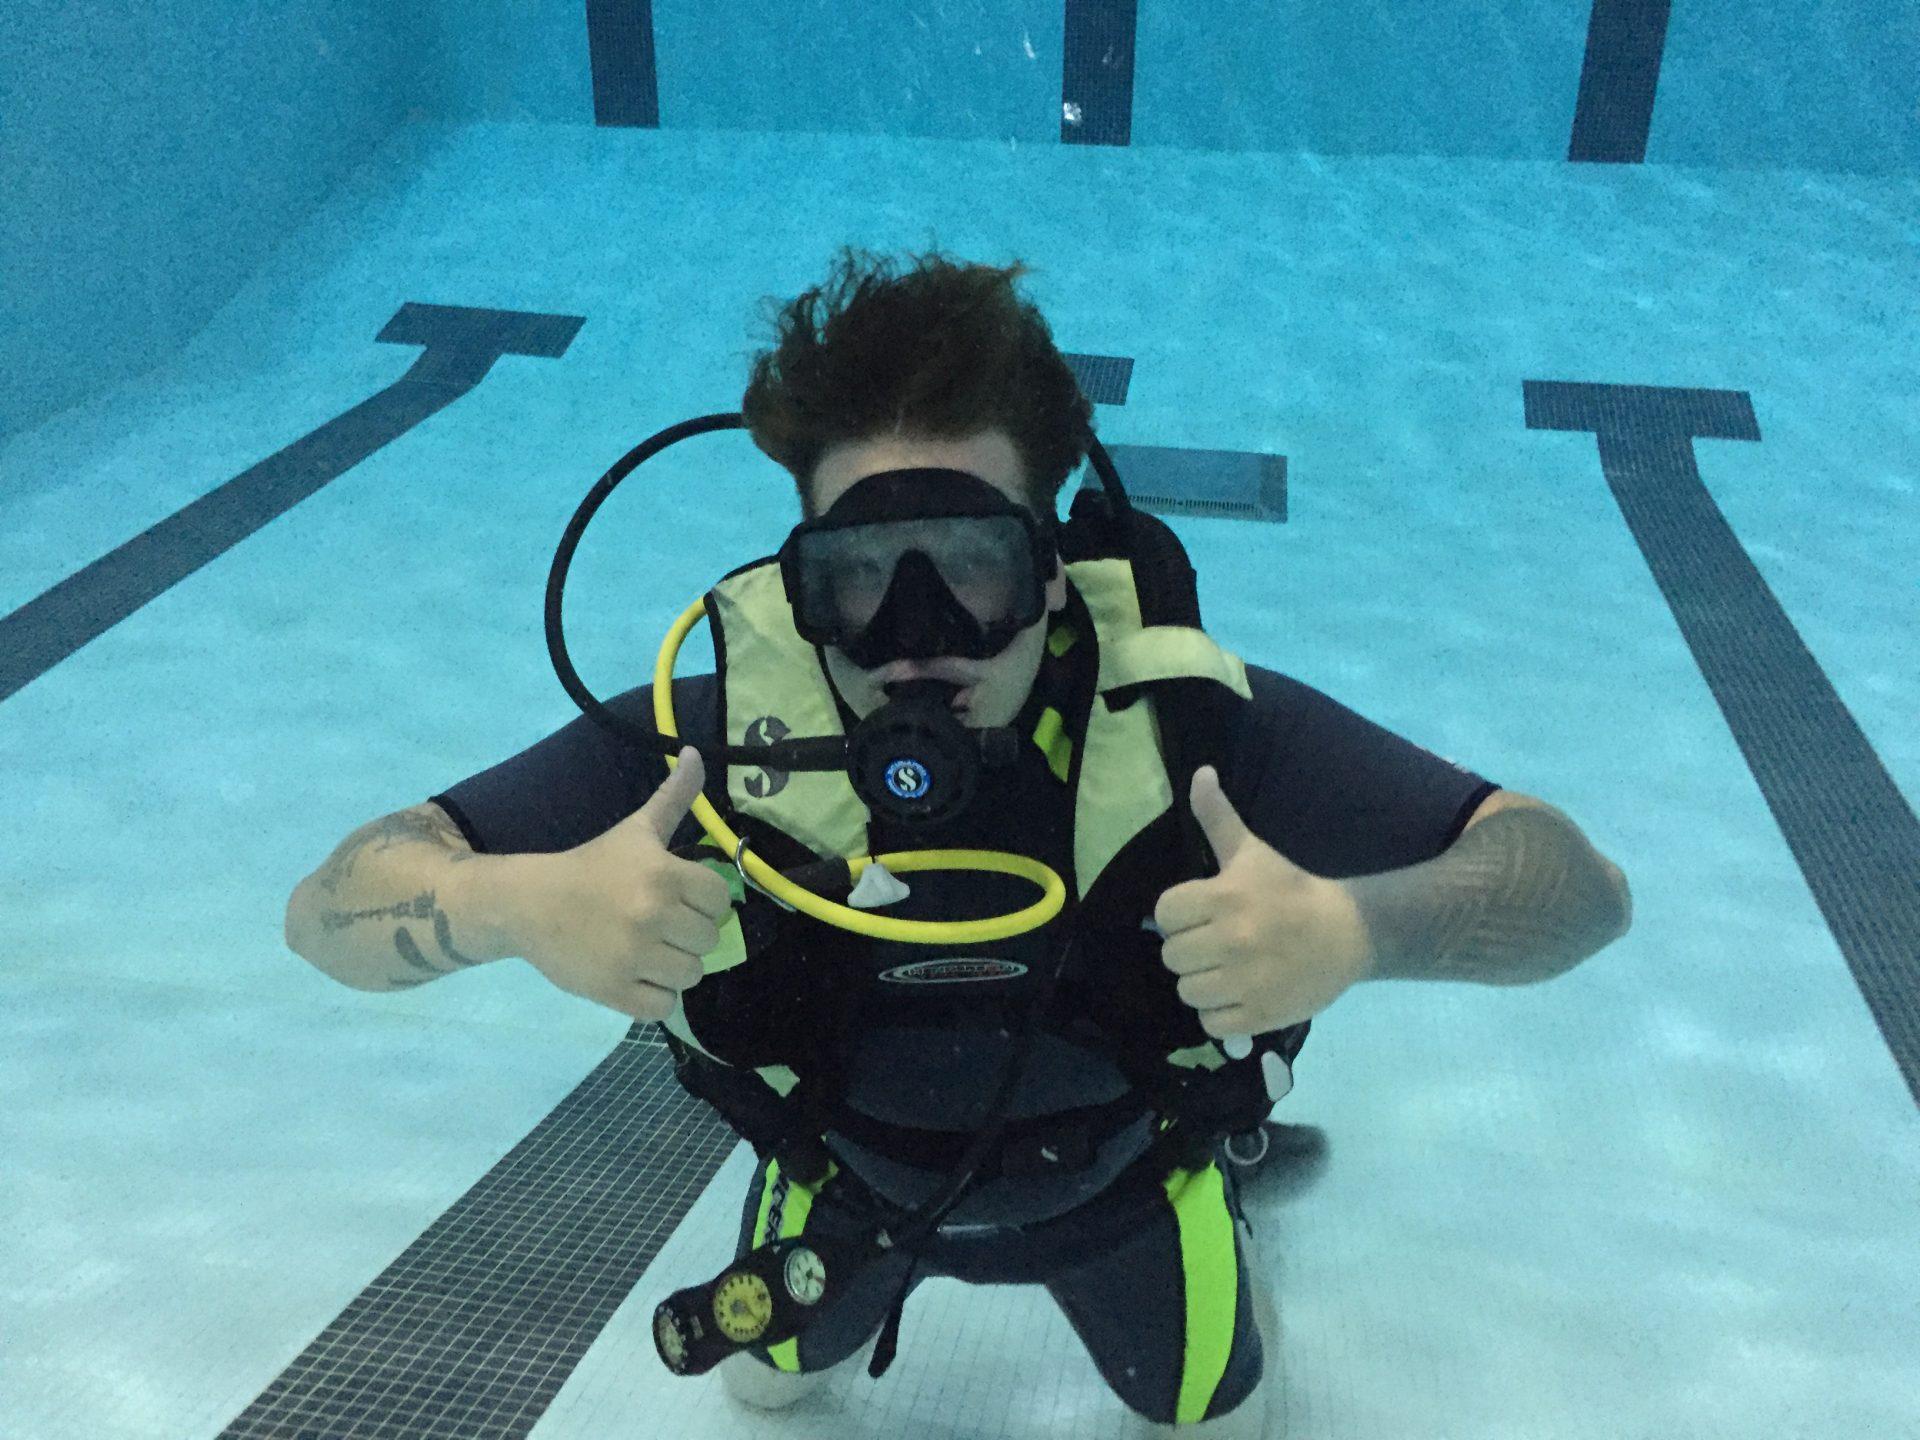 scuba diver in pool